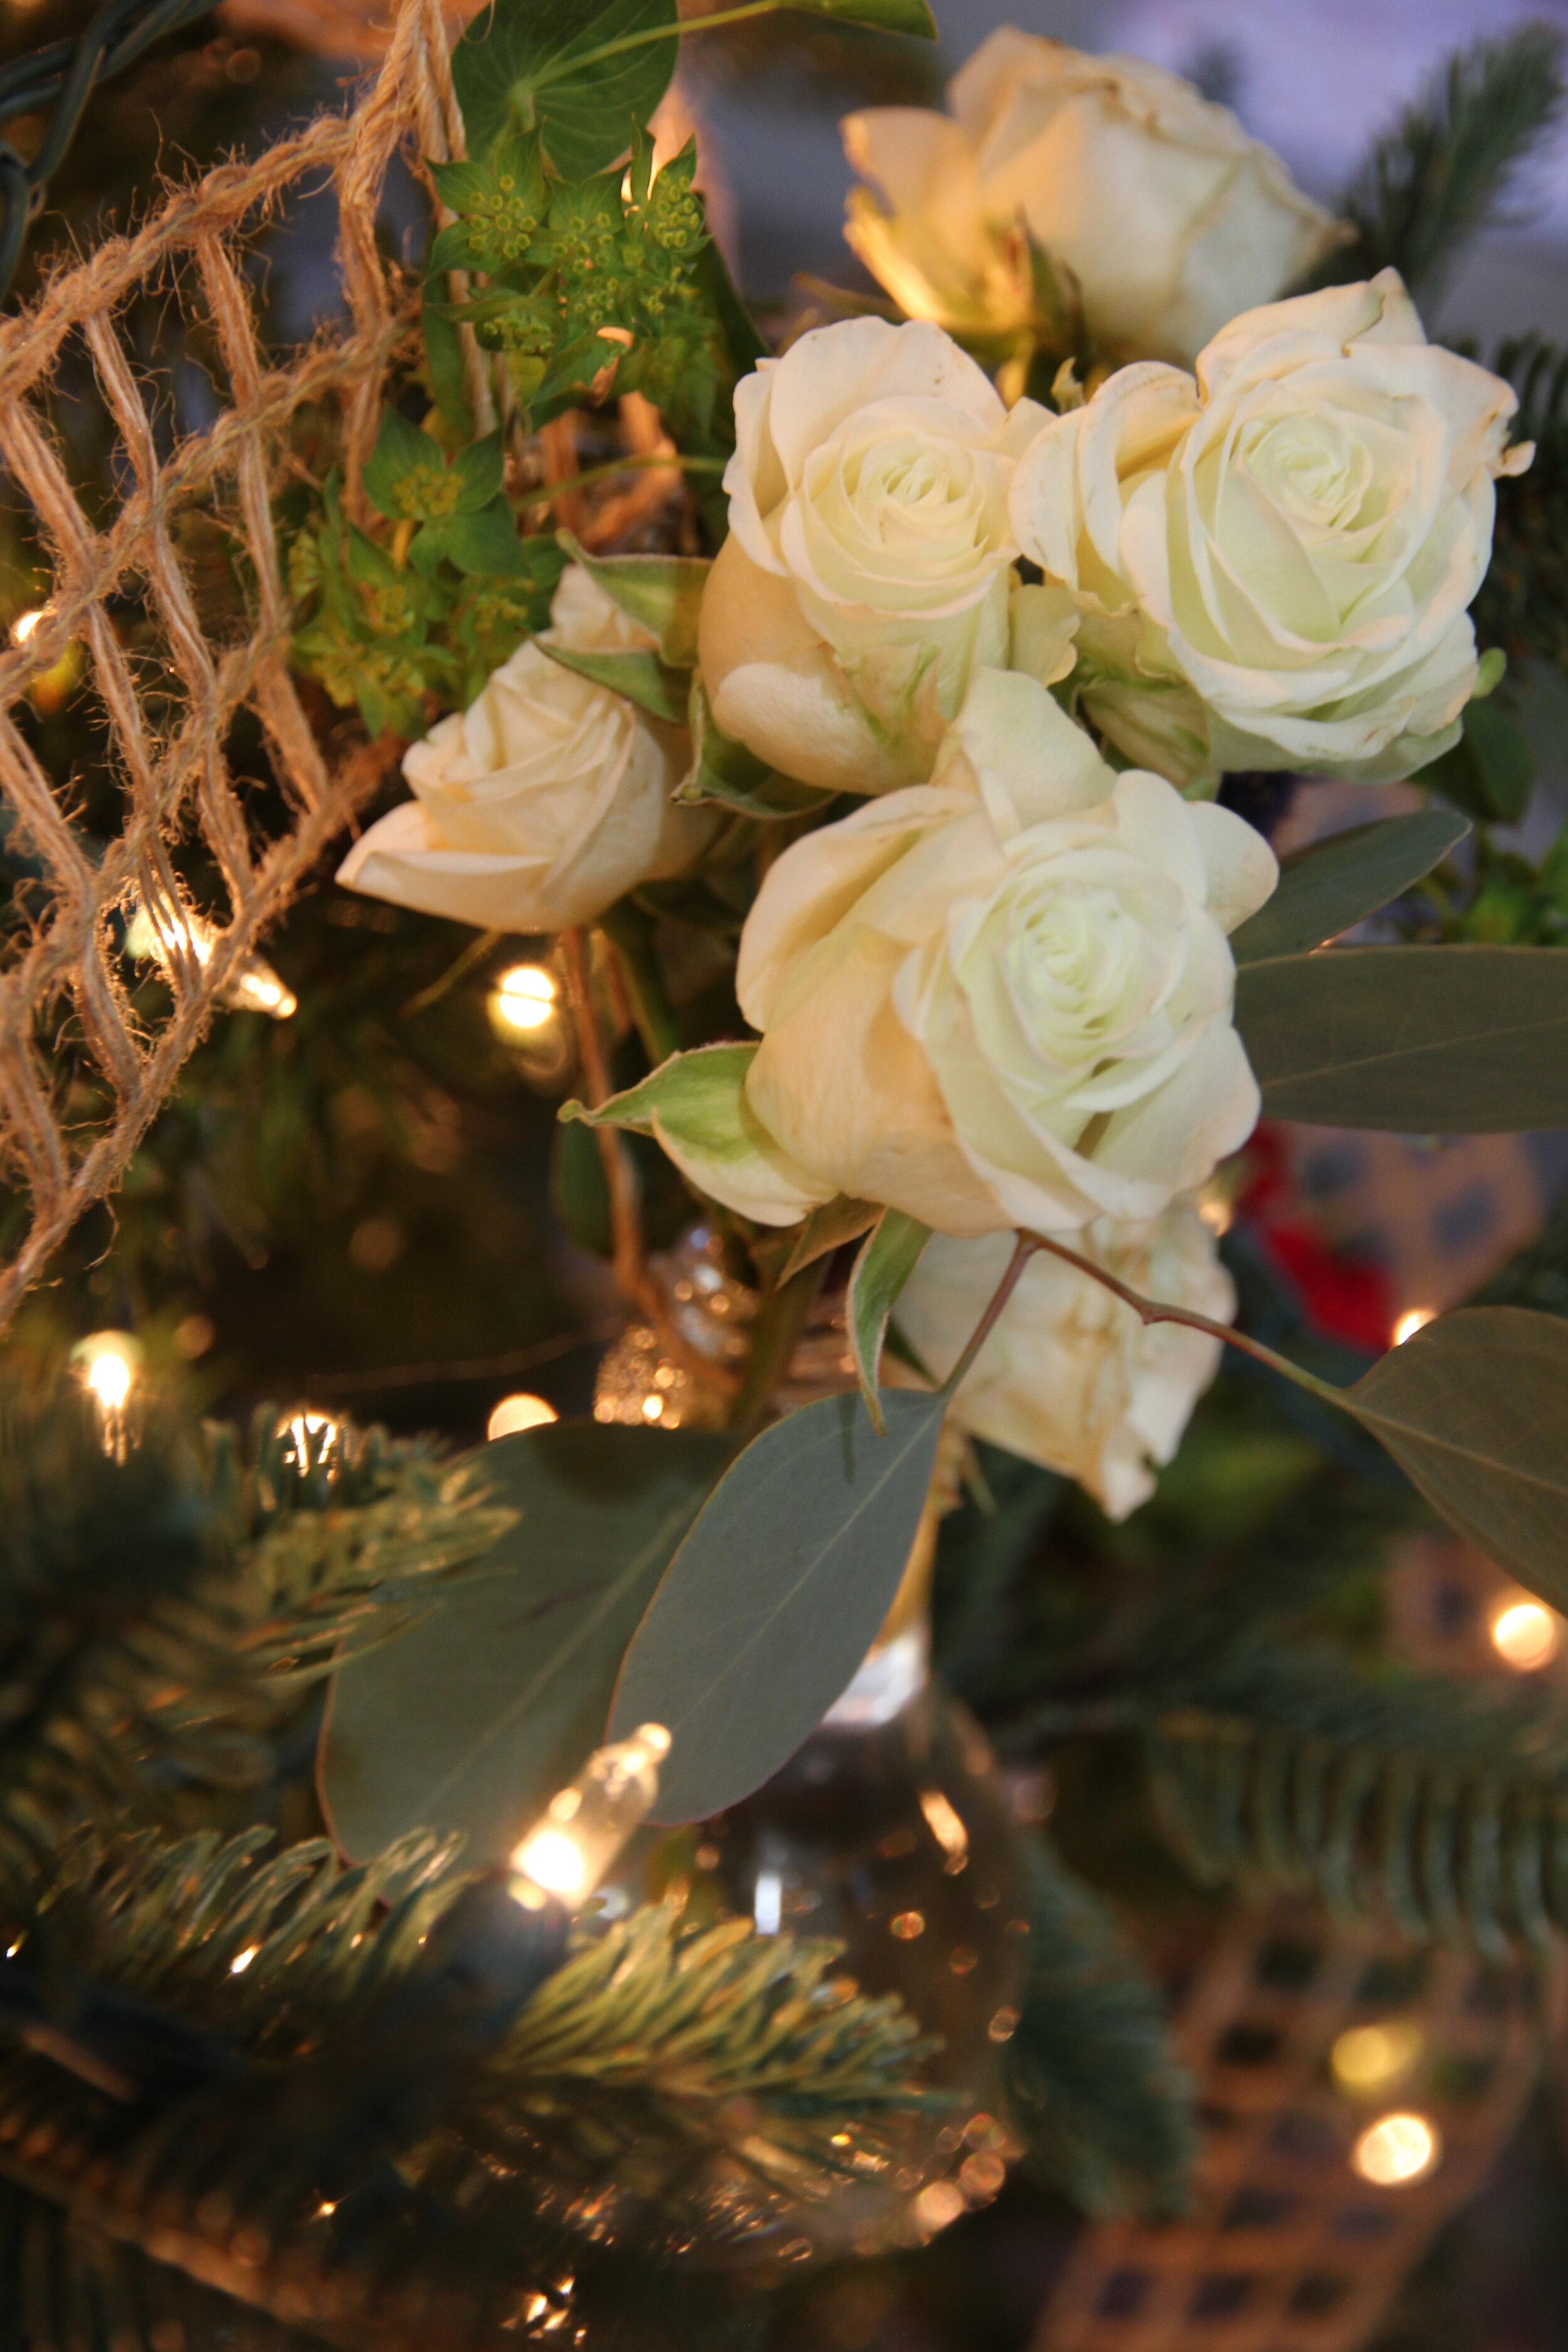 White roses on Christmas Tree